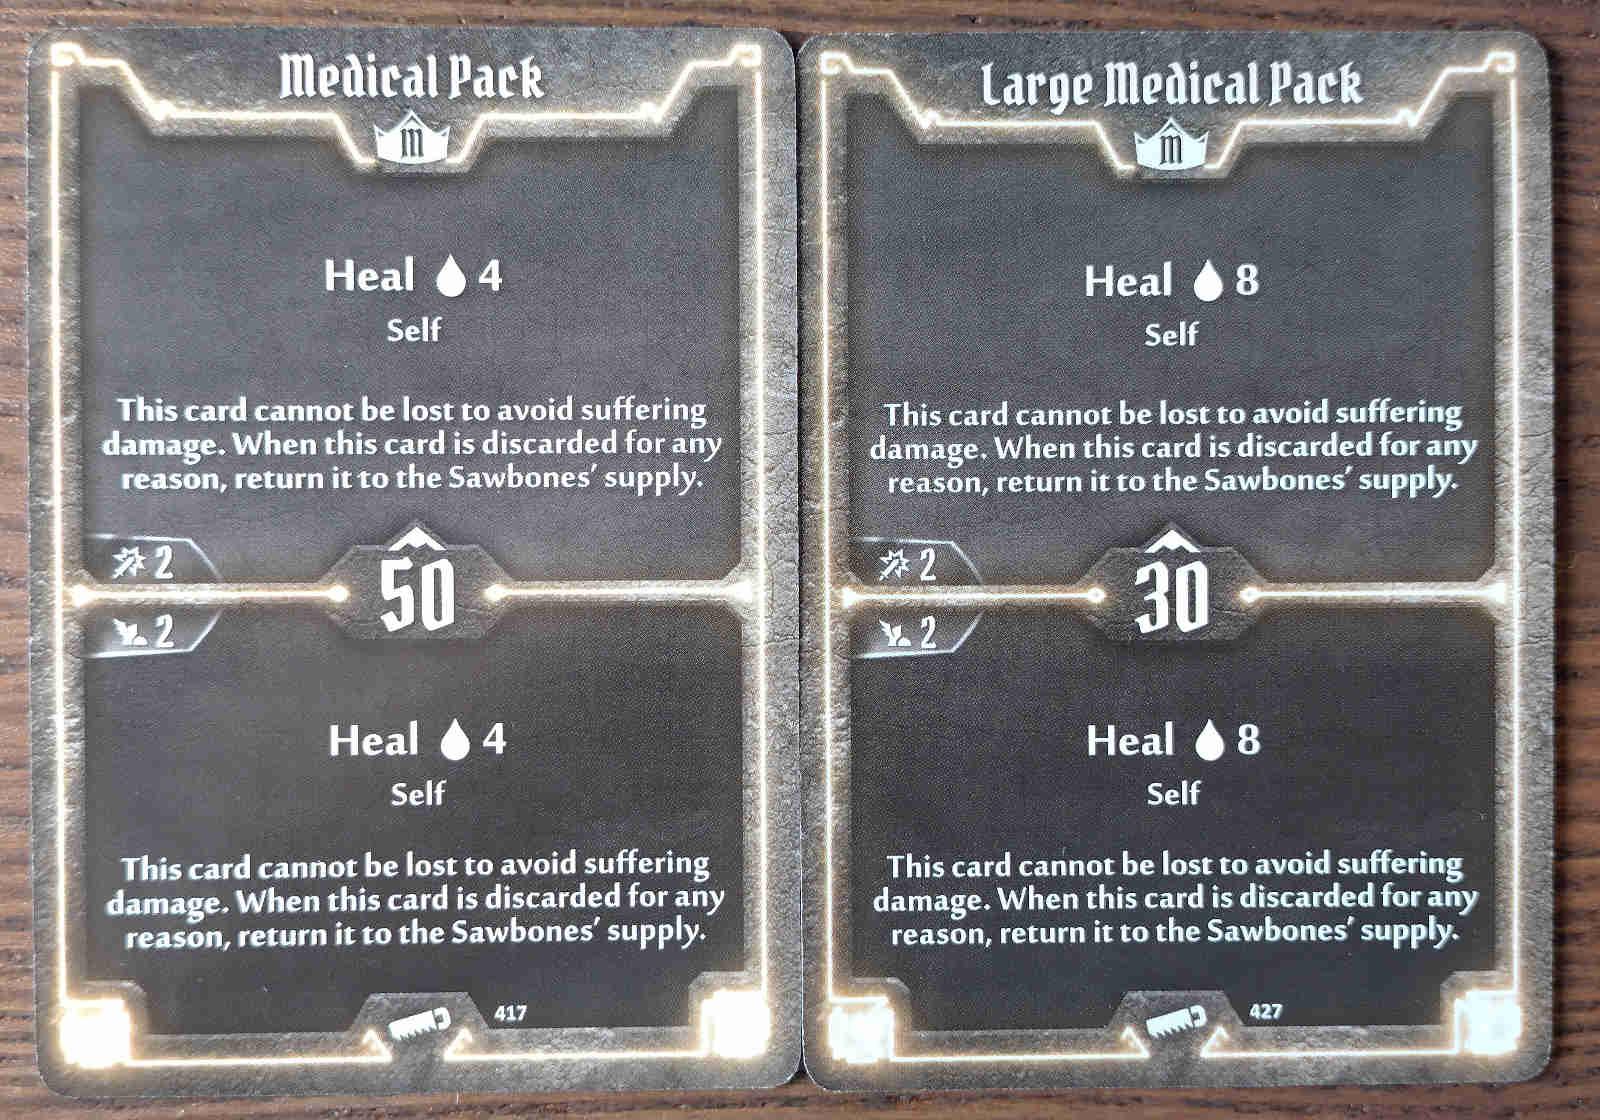 Sawbones Medical Pack and Large Medical Pack cards